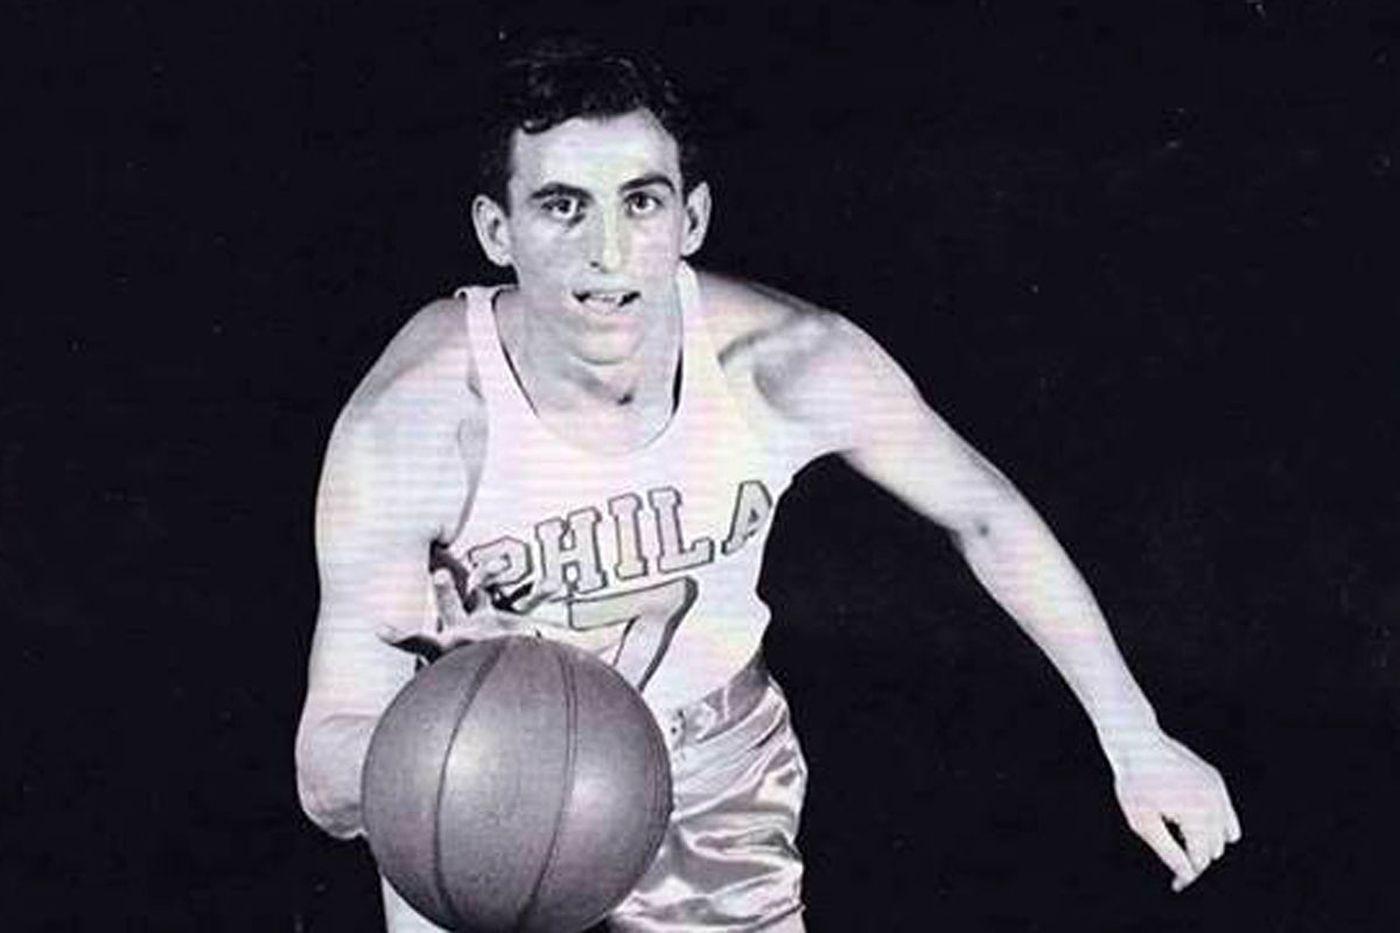 Jerry Rullo, 94, basketball pro became city rec coach